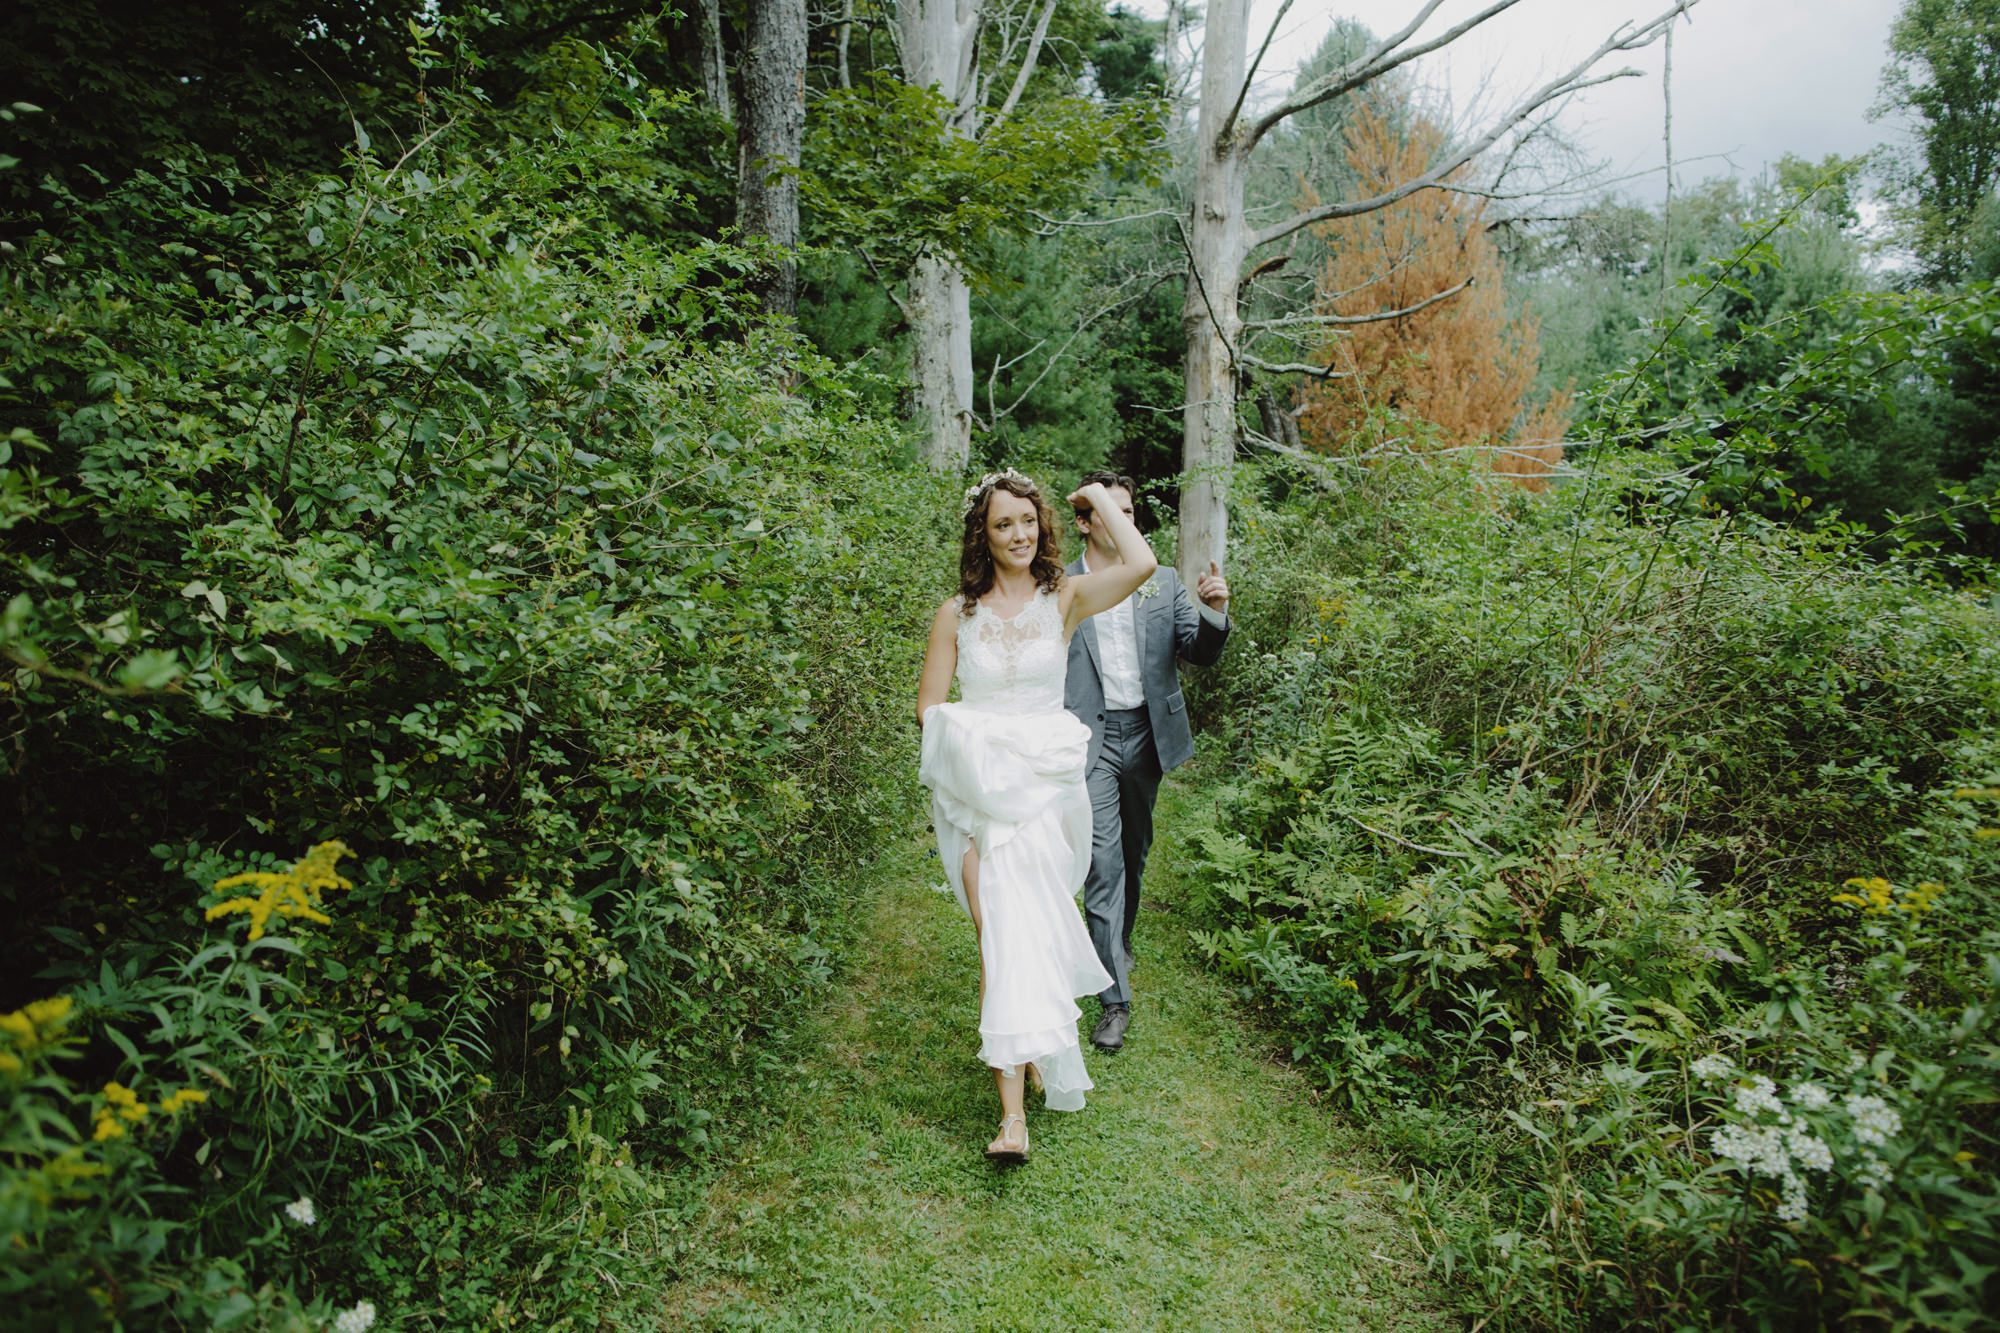 catskills_big_indian_springs_upstate_NY_wedding_sammblake086.jpg